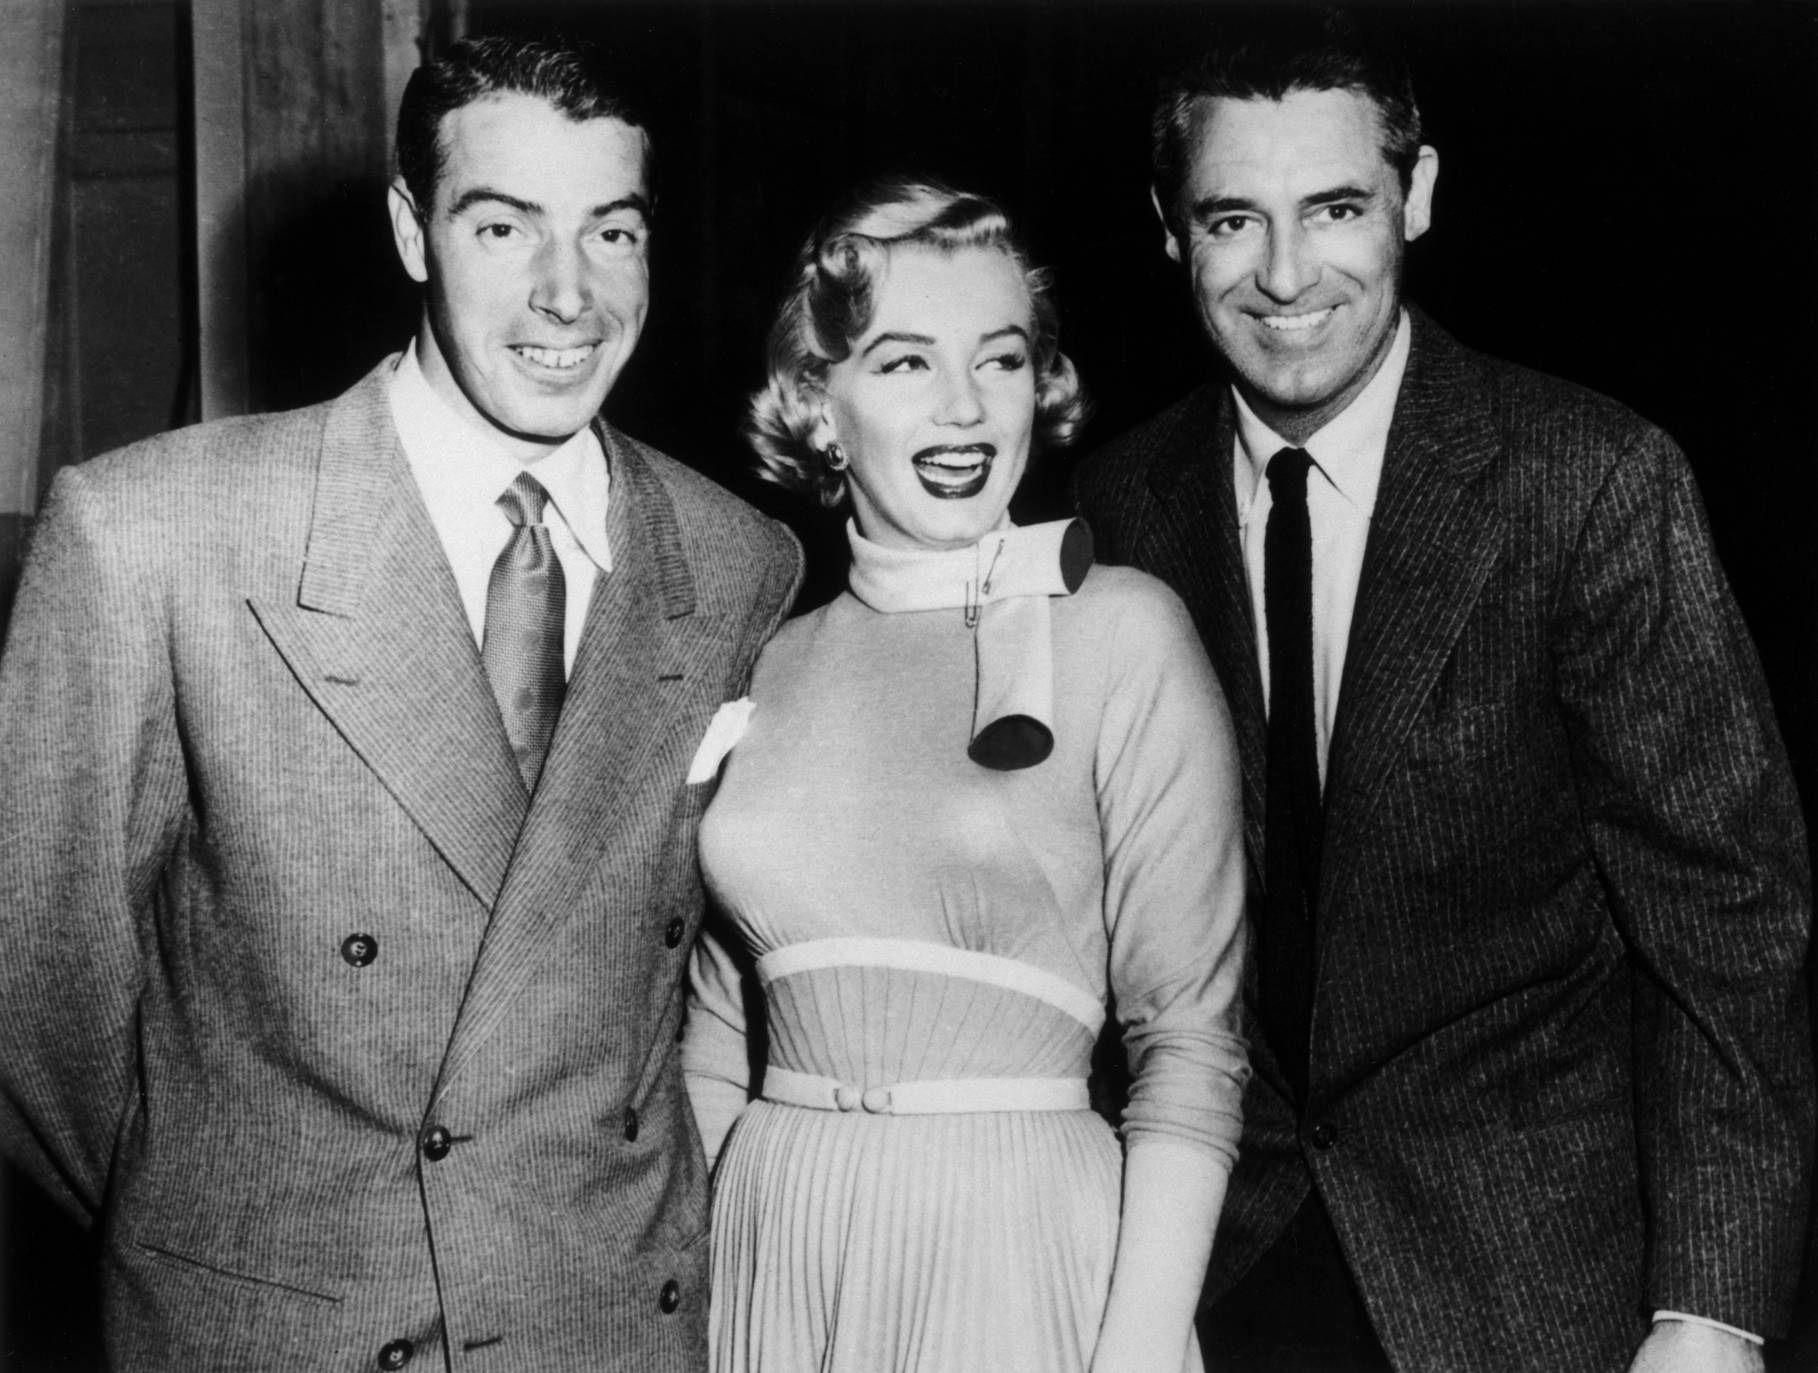 Marilyn Monroe Photo Marilyn Monroe Joe Dimaggio And Cary Grant Monkey Business Marilyn Monroe Photos Joe Dimaggio Marilyn Monroe Classic Hollywood